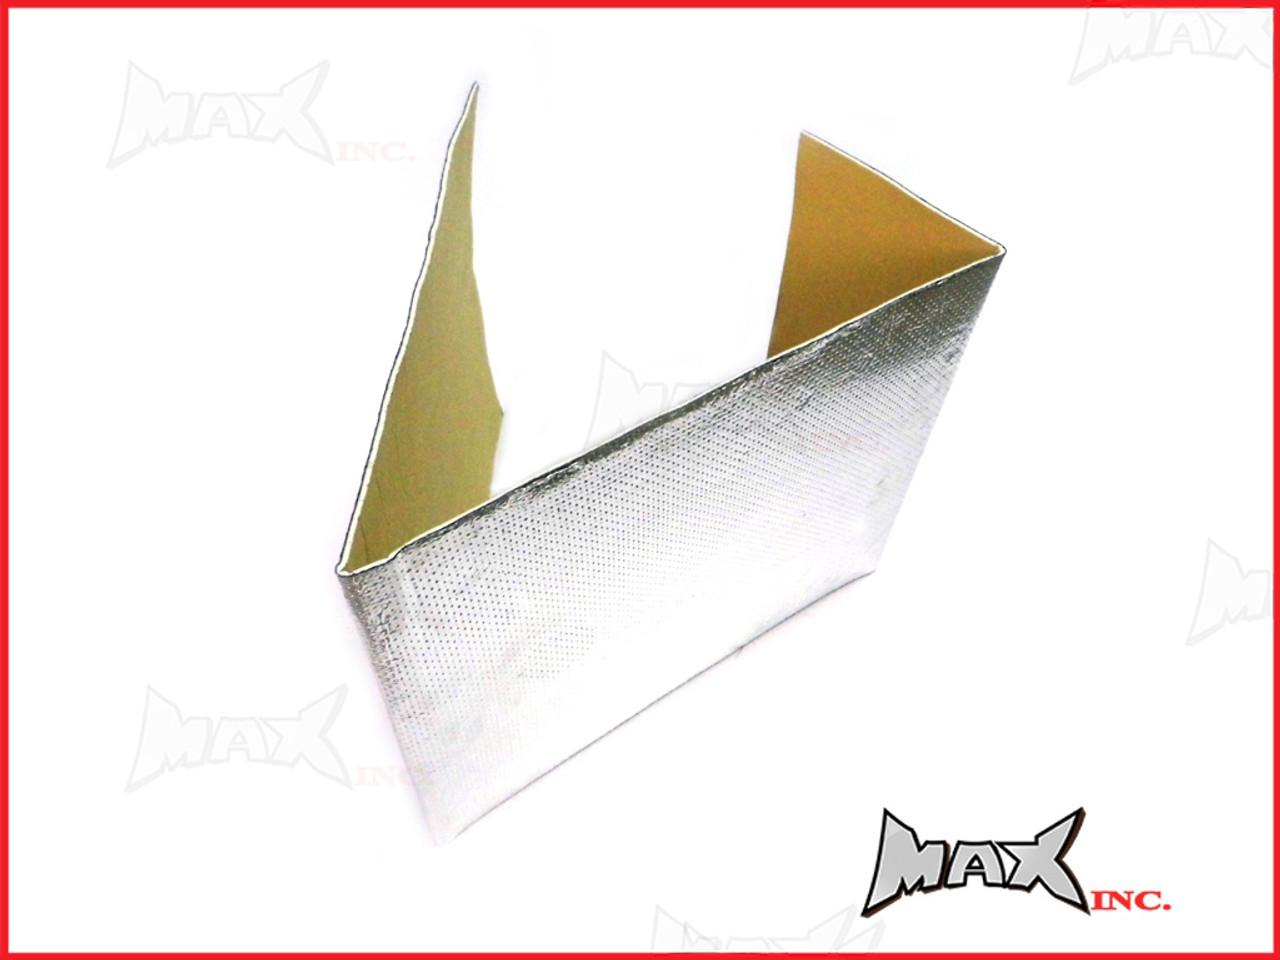 Self Adhesive Exhaust Aluminium Reflective Heat Shield - 100cm x 33cm